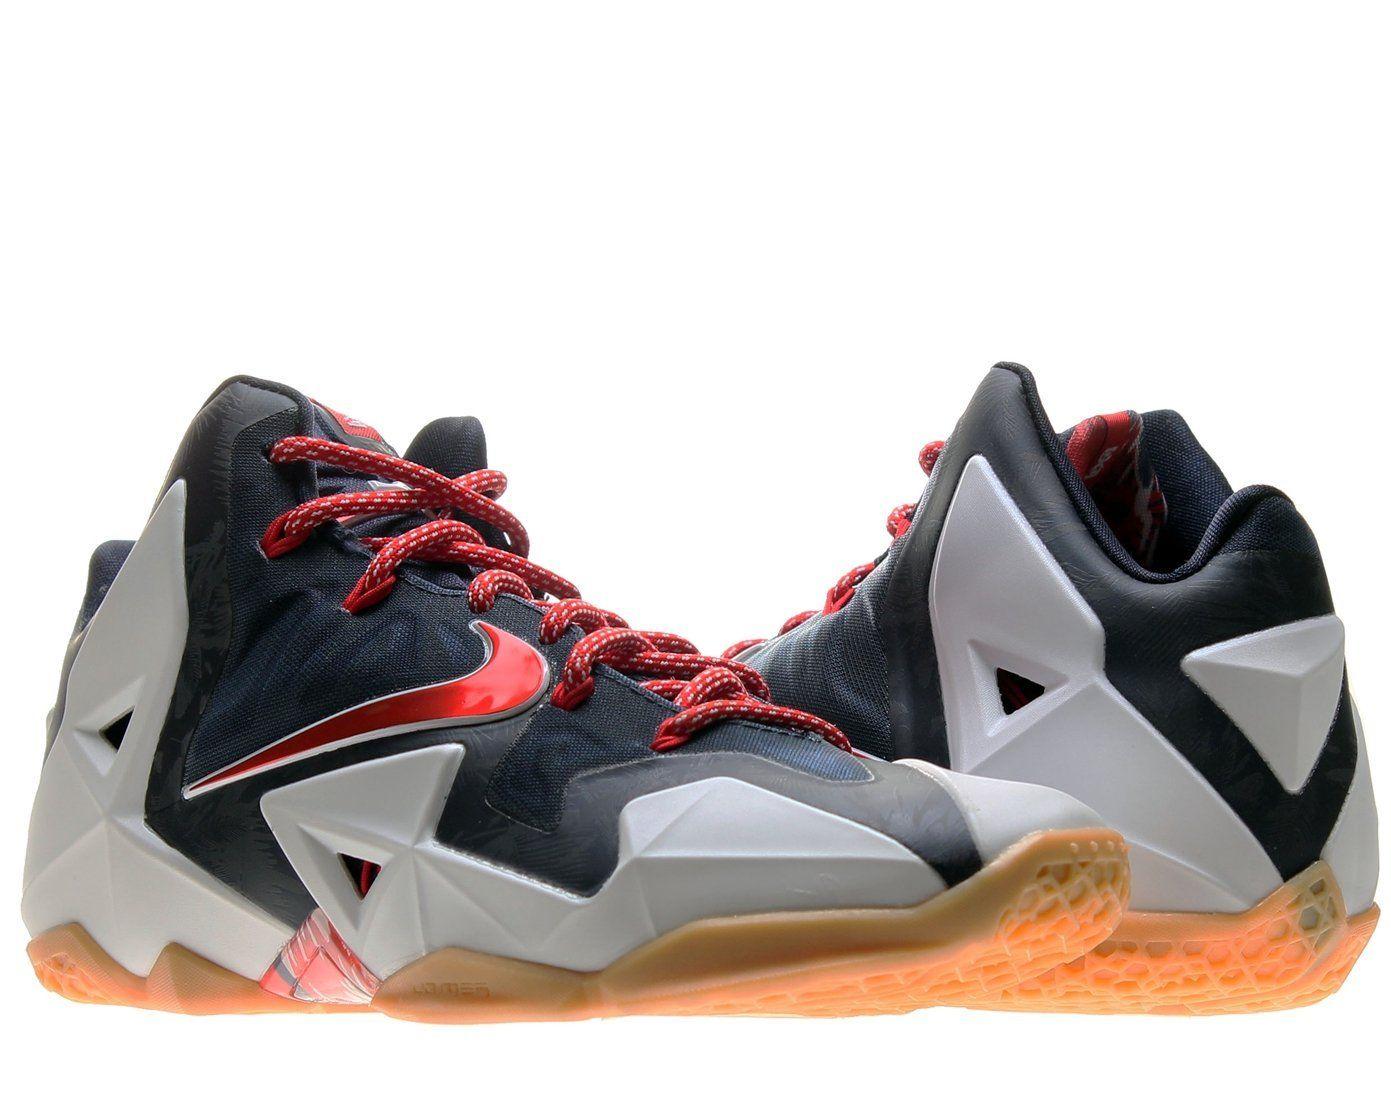 : nike uomini lebron xi basket basket scarpa: